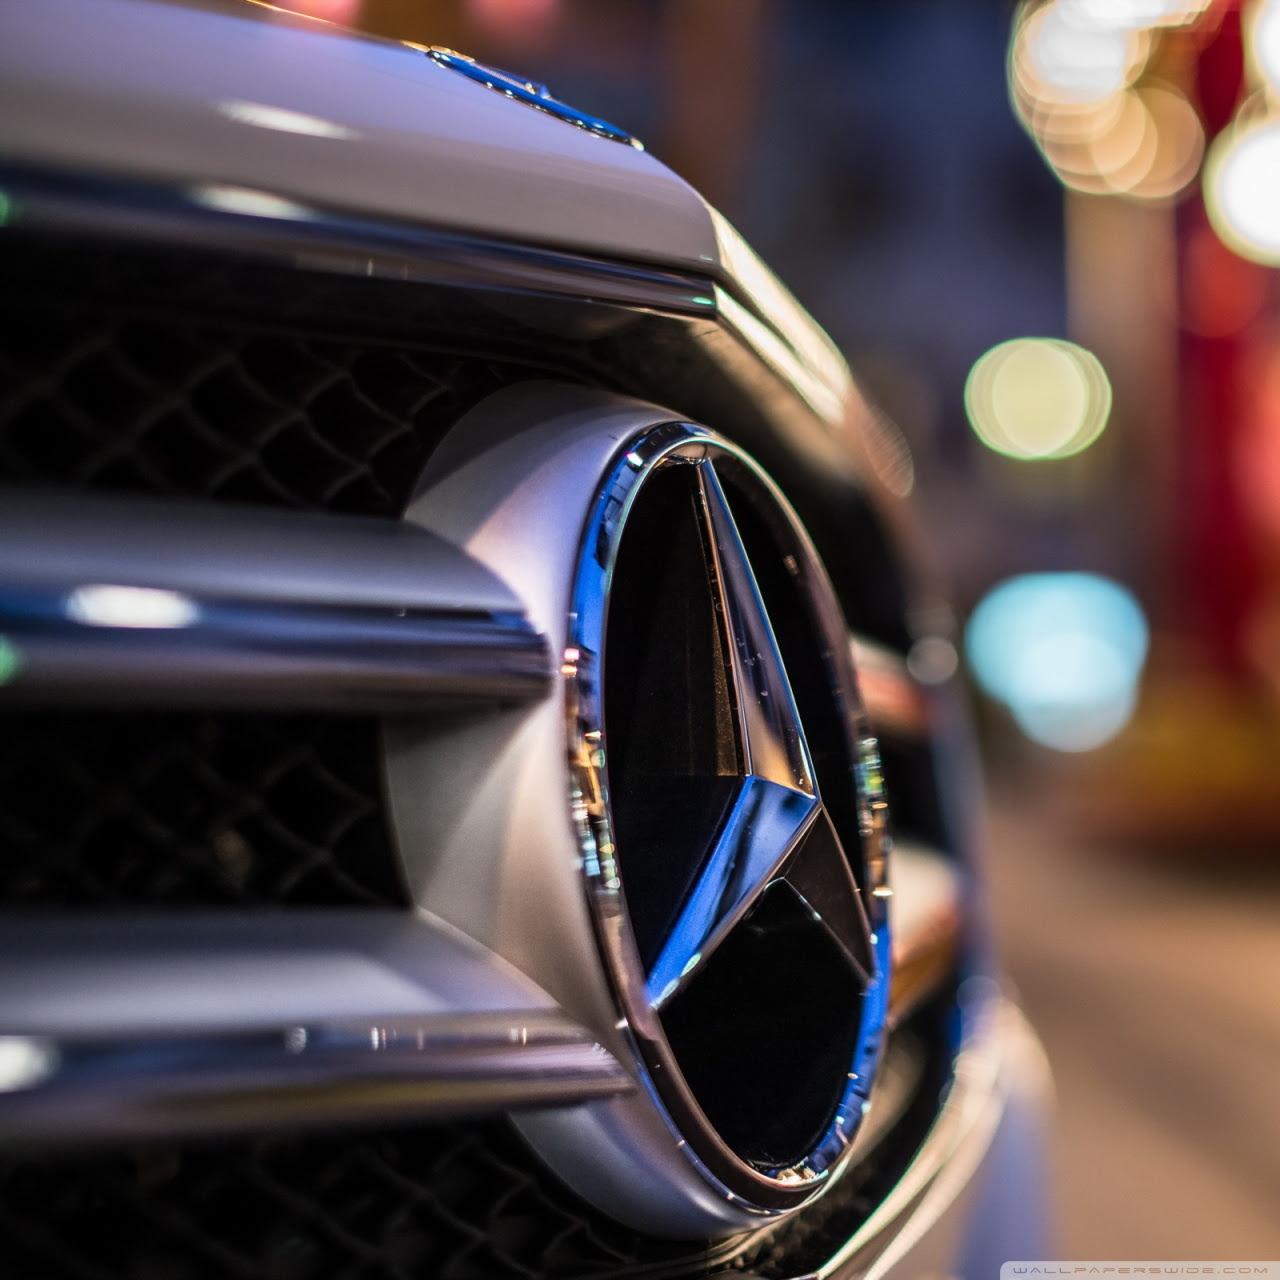 Mercedes Benz Wallpaper | View Wallpapers